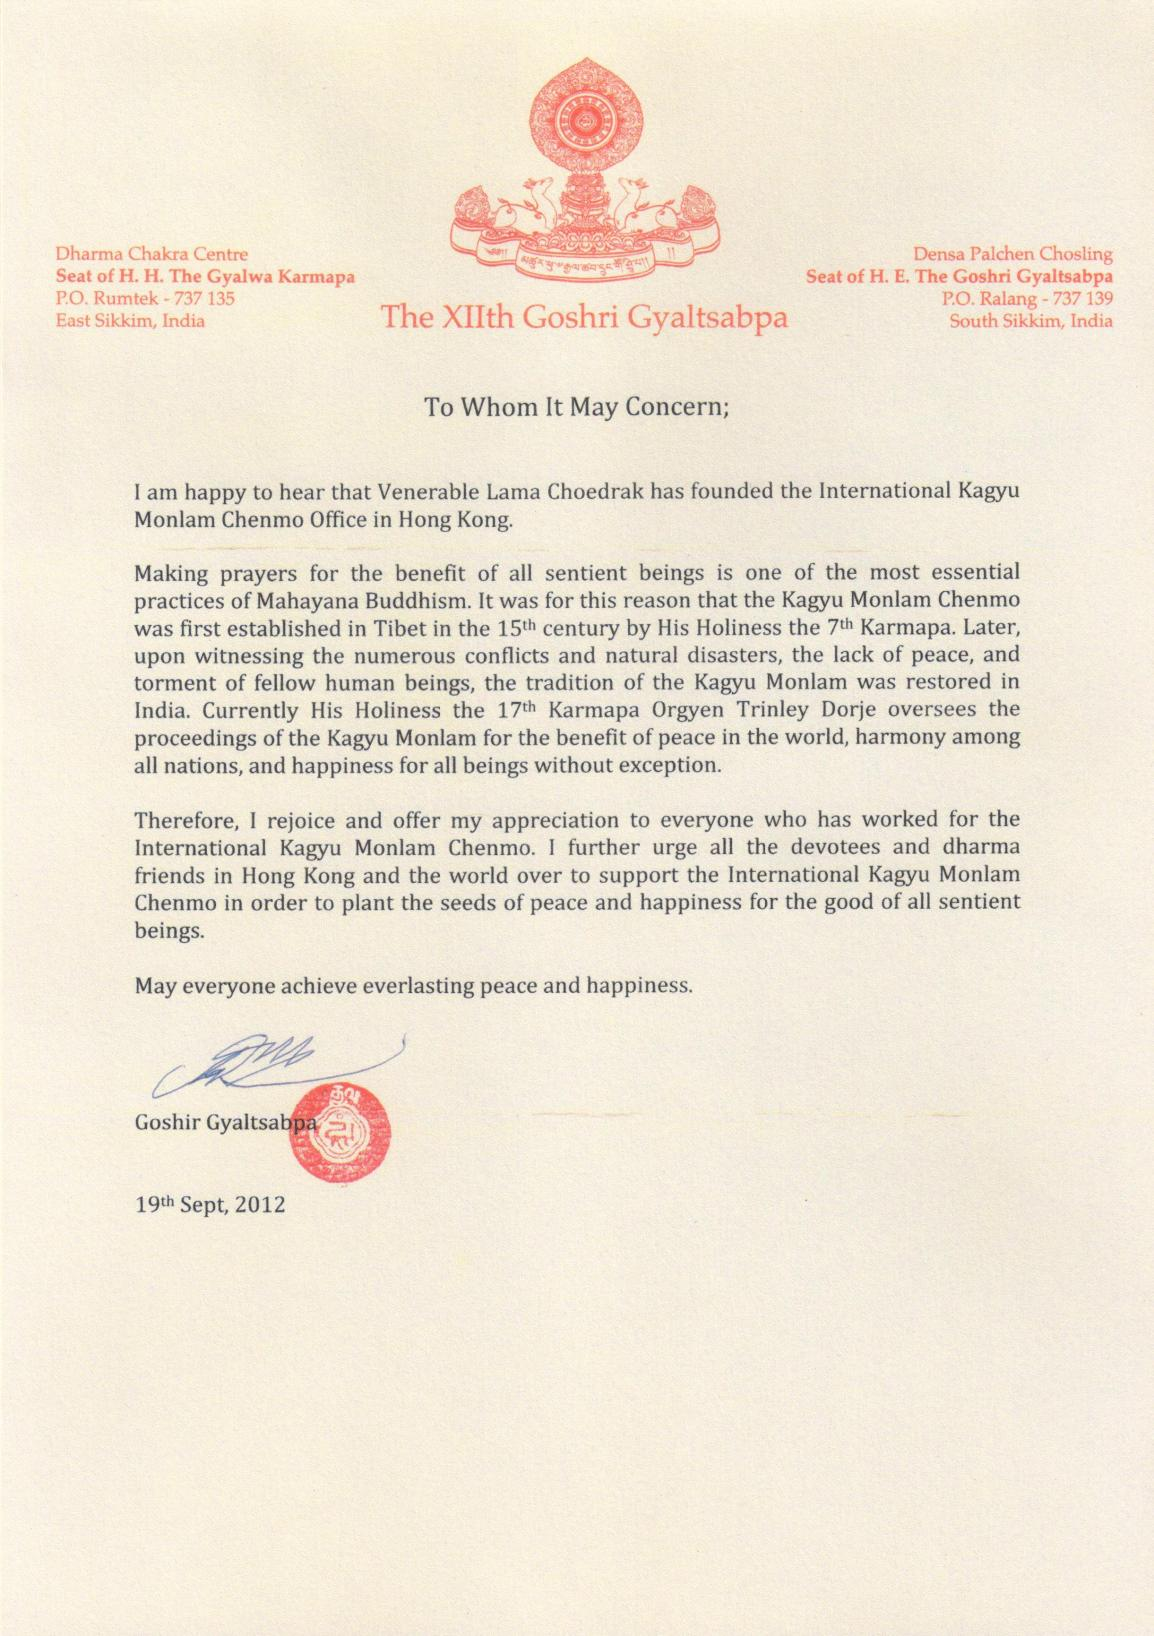 Letter from His Eminence Goshri Gyaltsab Rinpoche